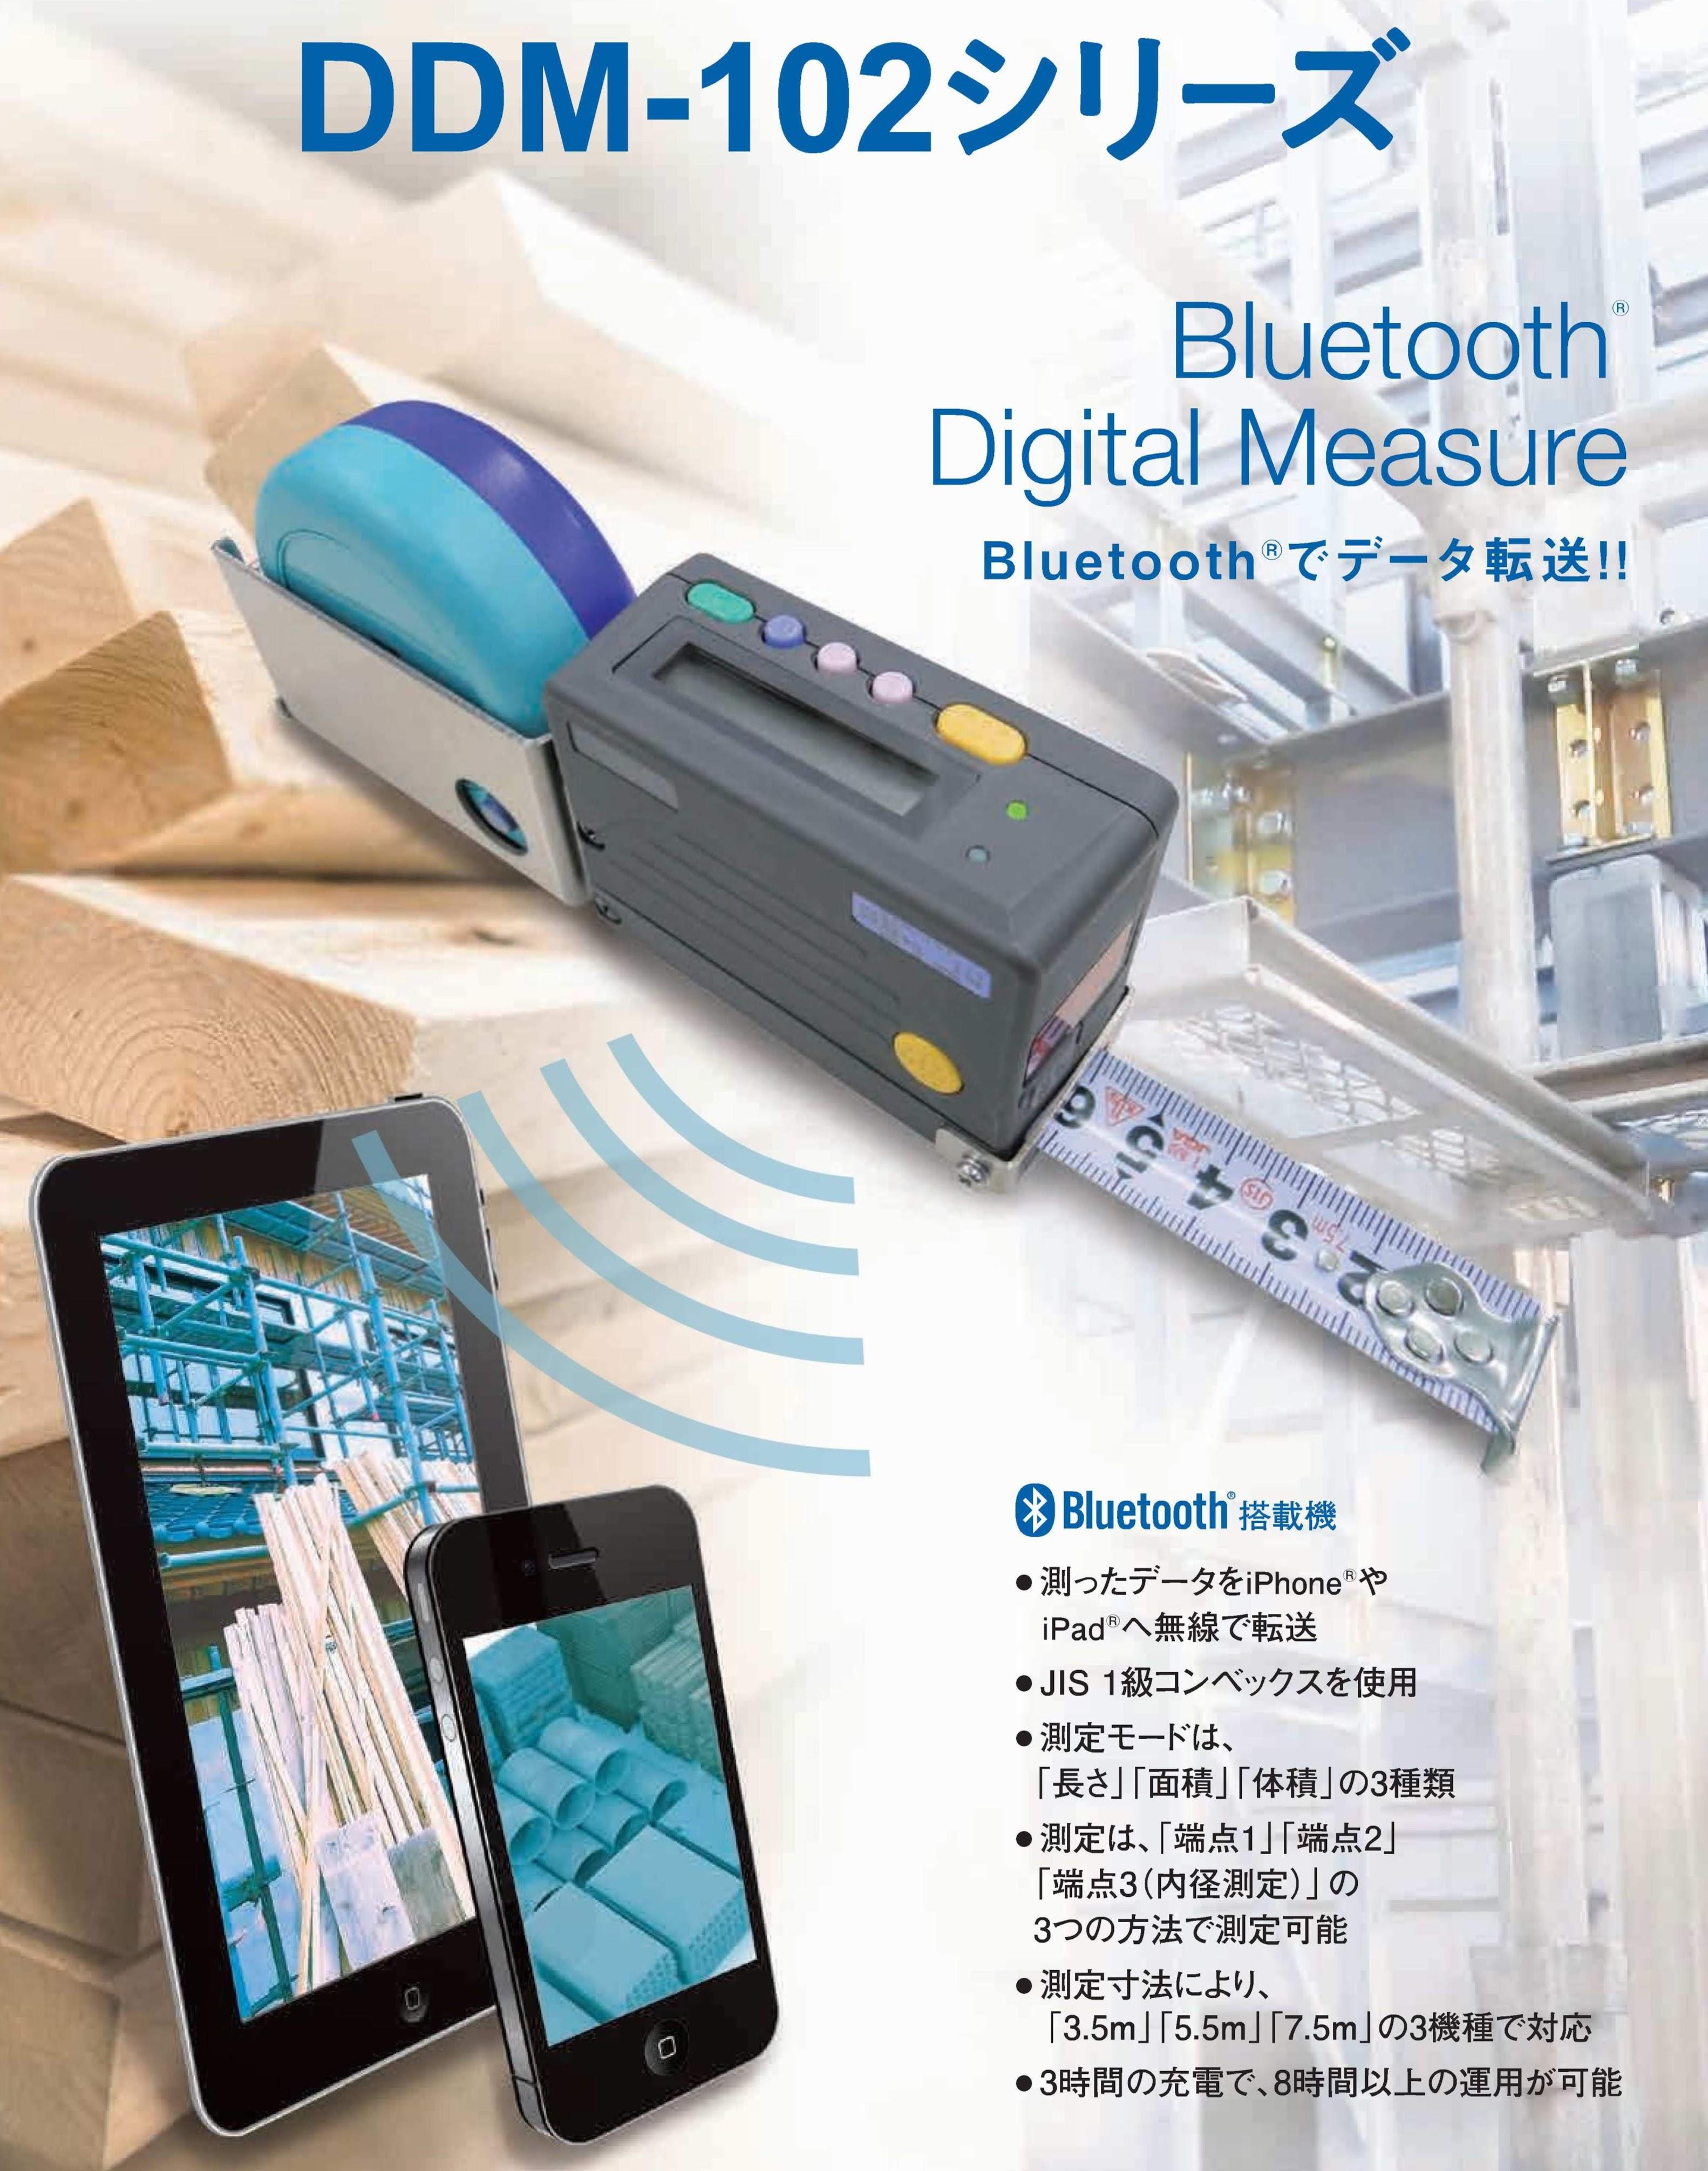 iOS対応 Bluetooth搭載デジタルメジャー DDM-102シリーズ